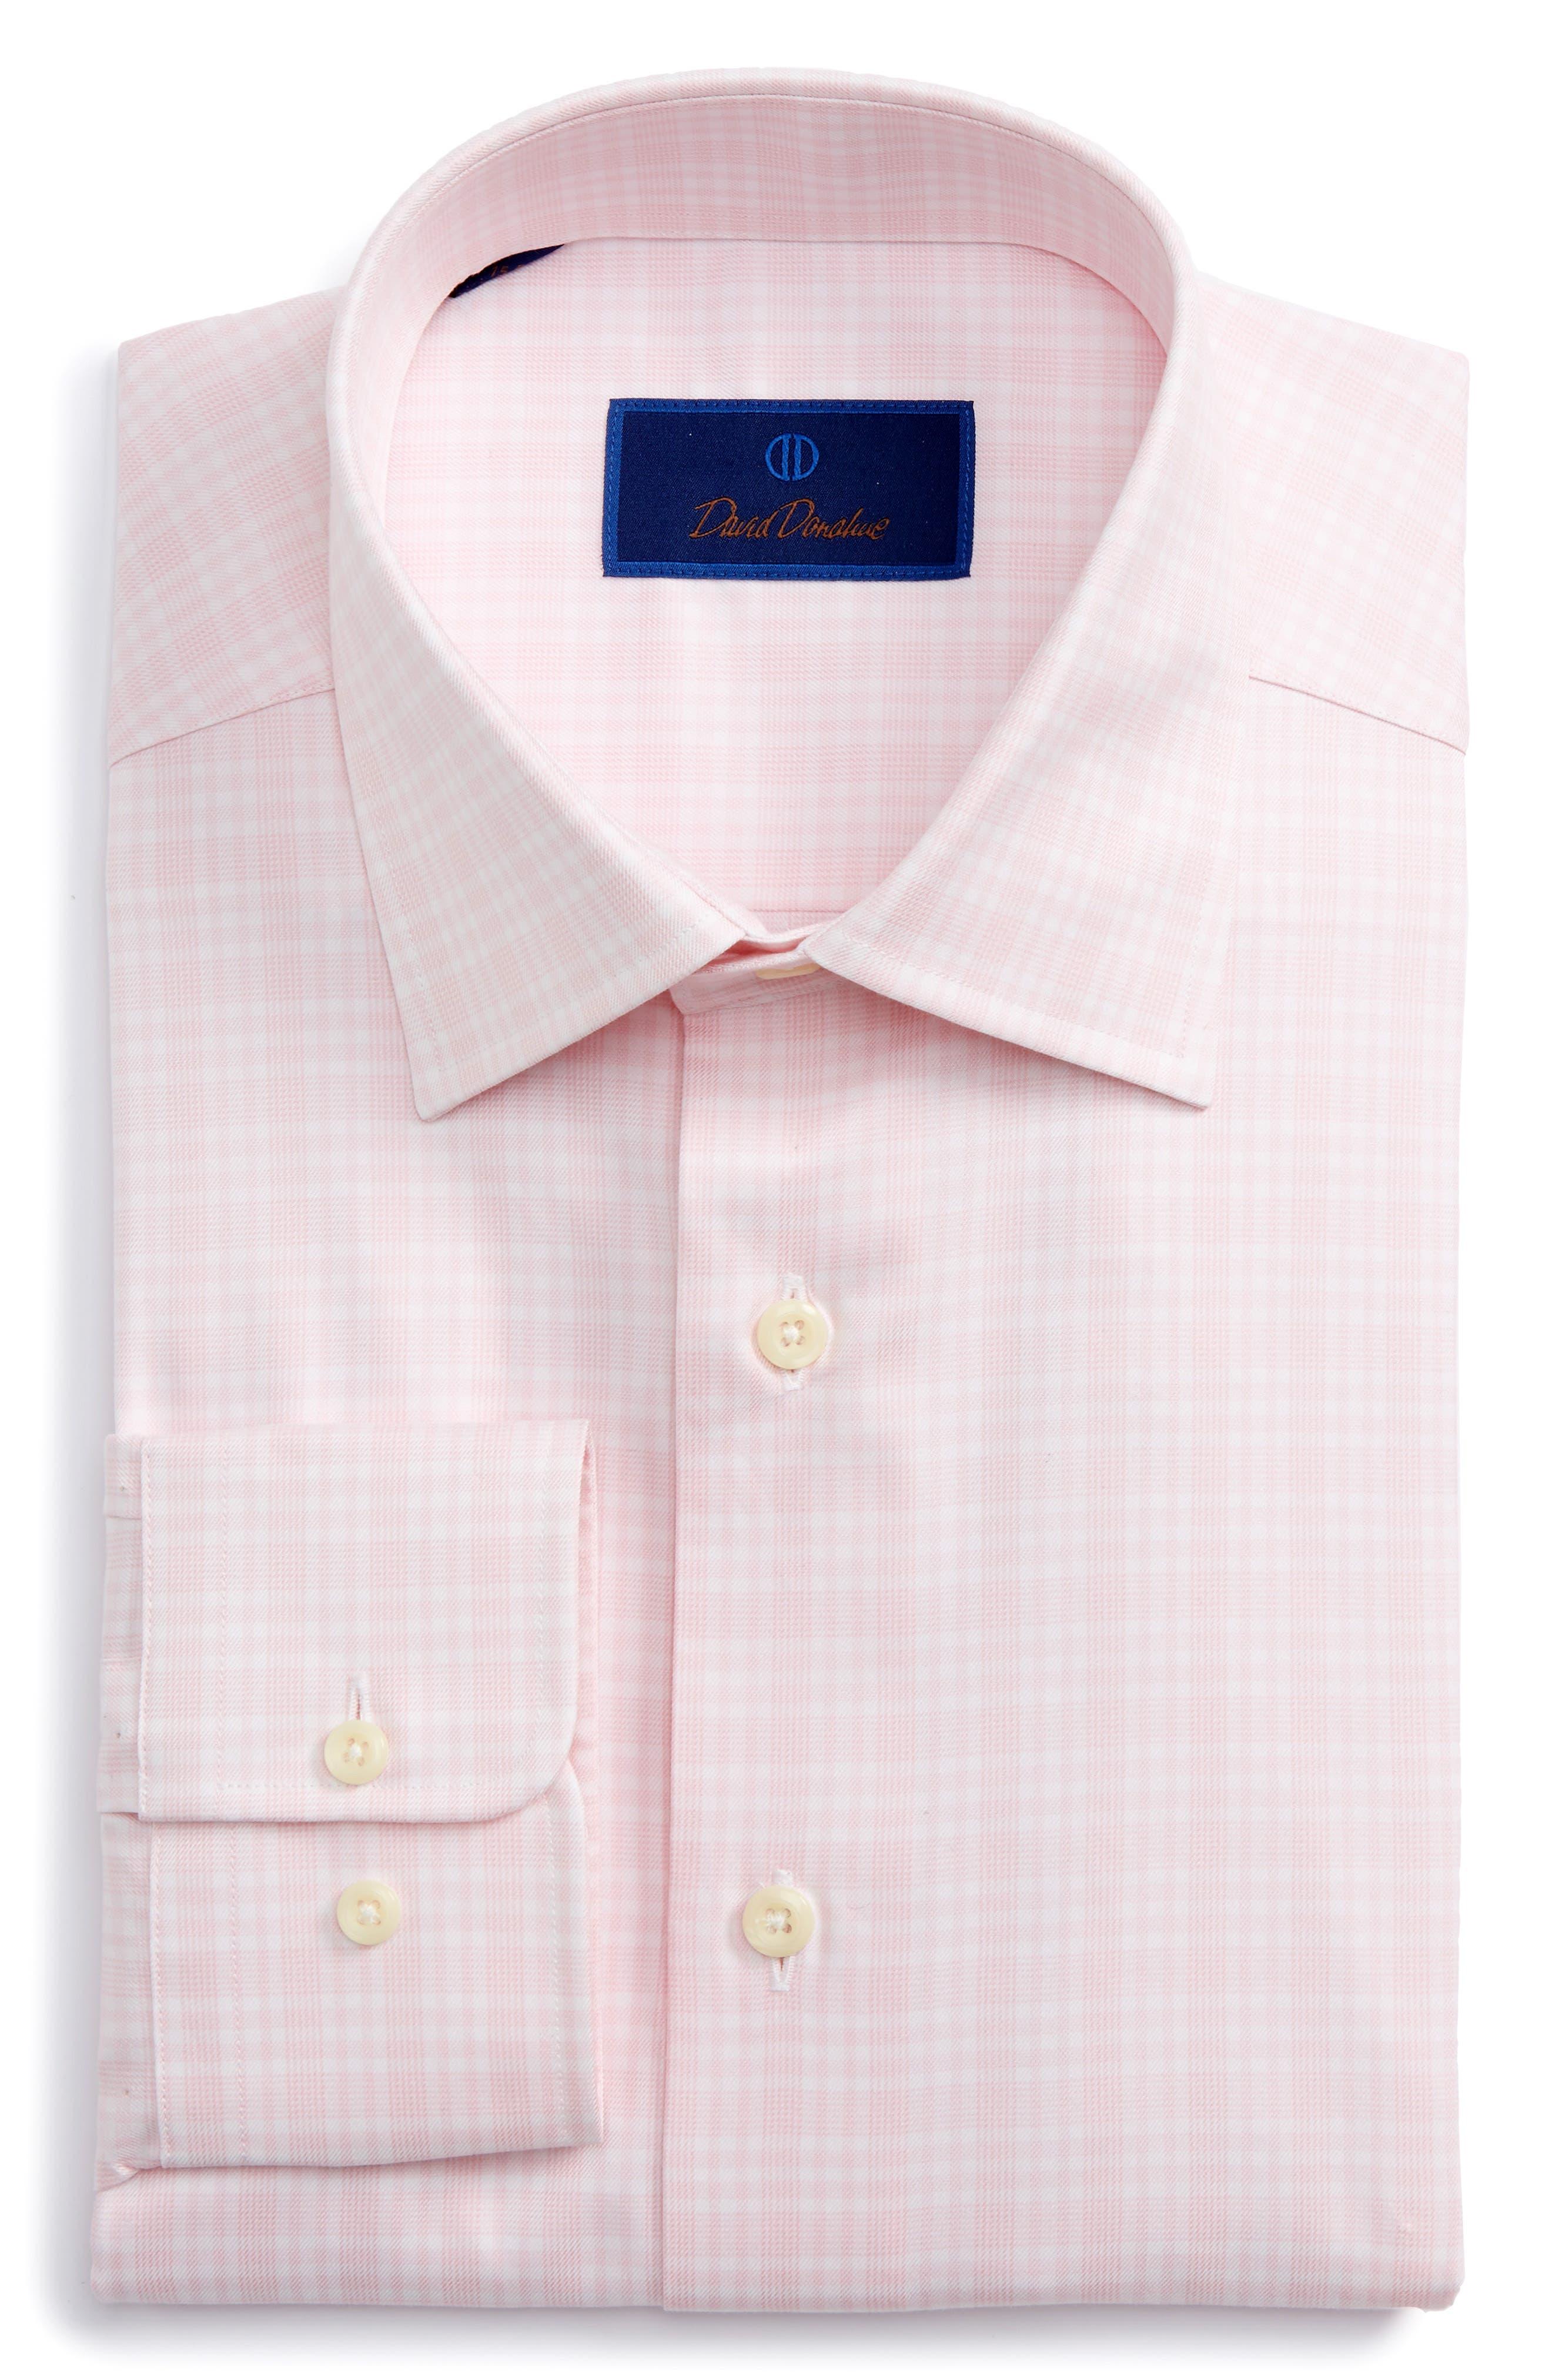 Regular Fit Plaid Dress Shirt,                         Main,                         color, 650